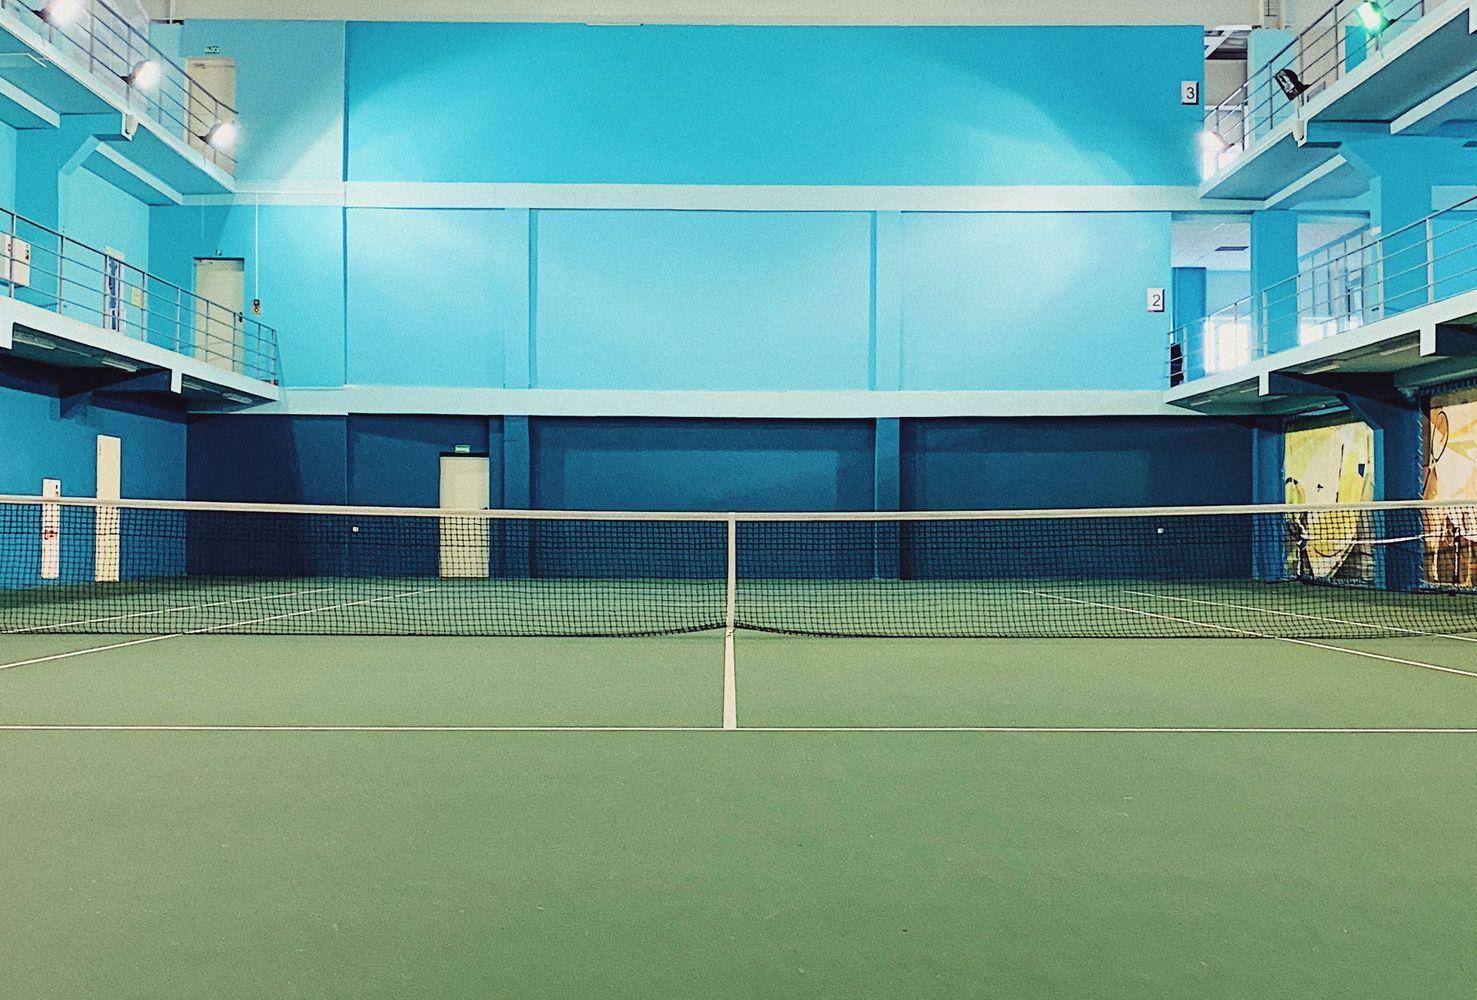 Bellevue Tennis Court Rentals